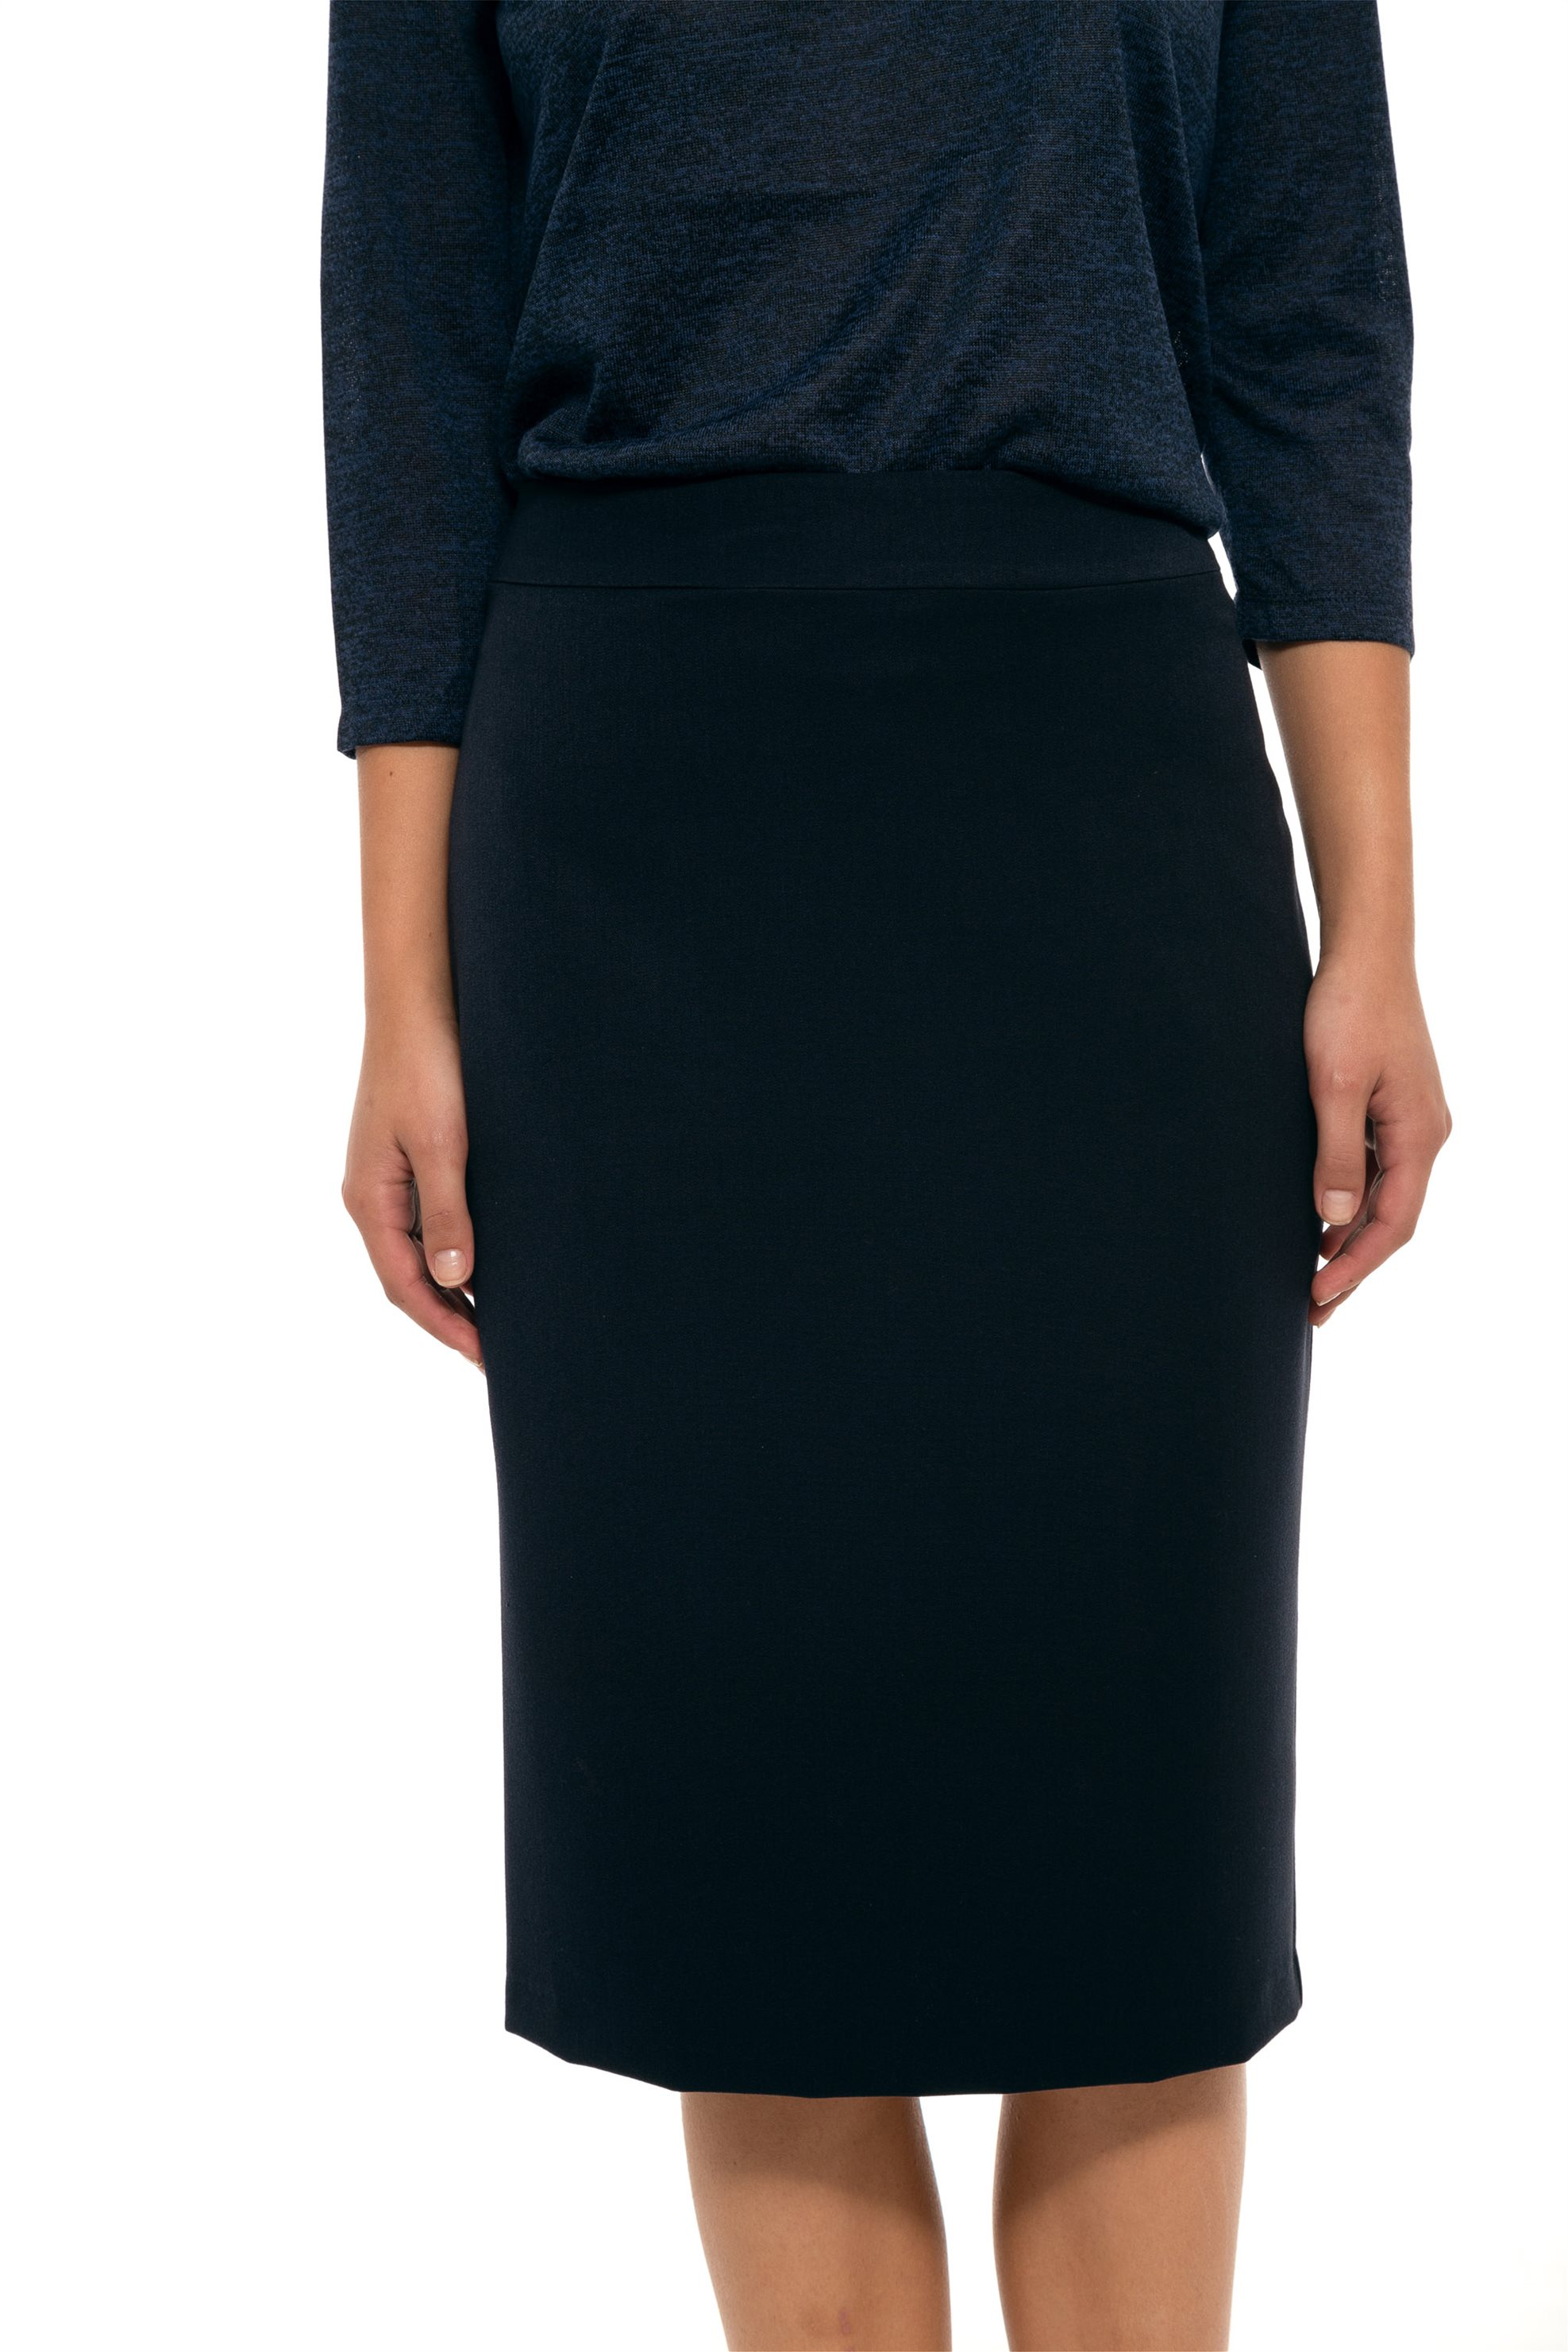 Paul Christophe γυναικεία κρεπ φούστα pencil με κανονική μέση - 833109 - Μπλε Σκ γυναικα   ρουχα   φούστες   pencil